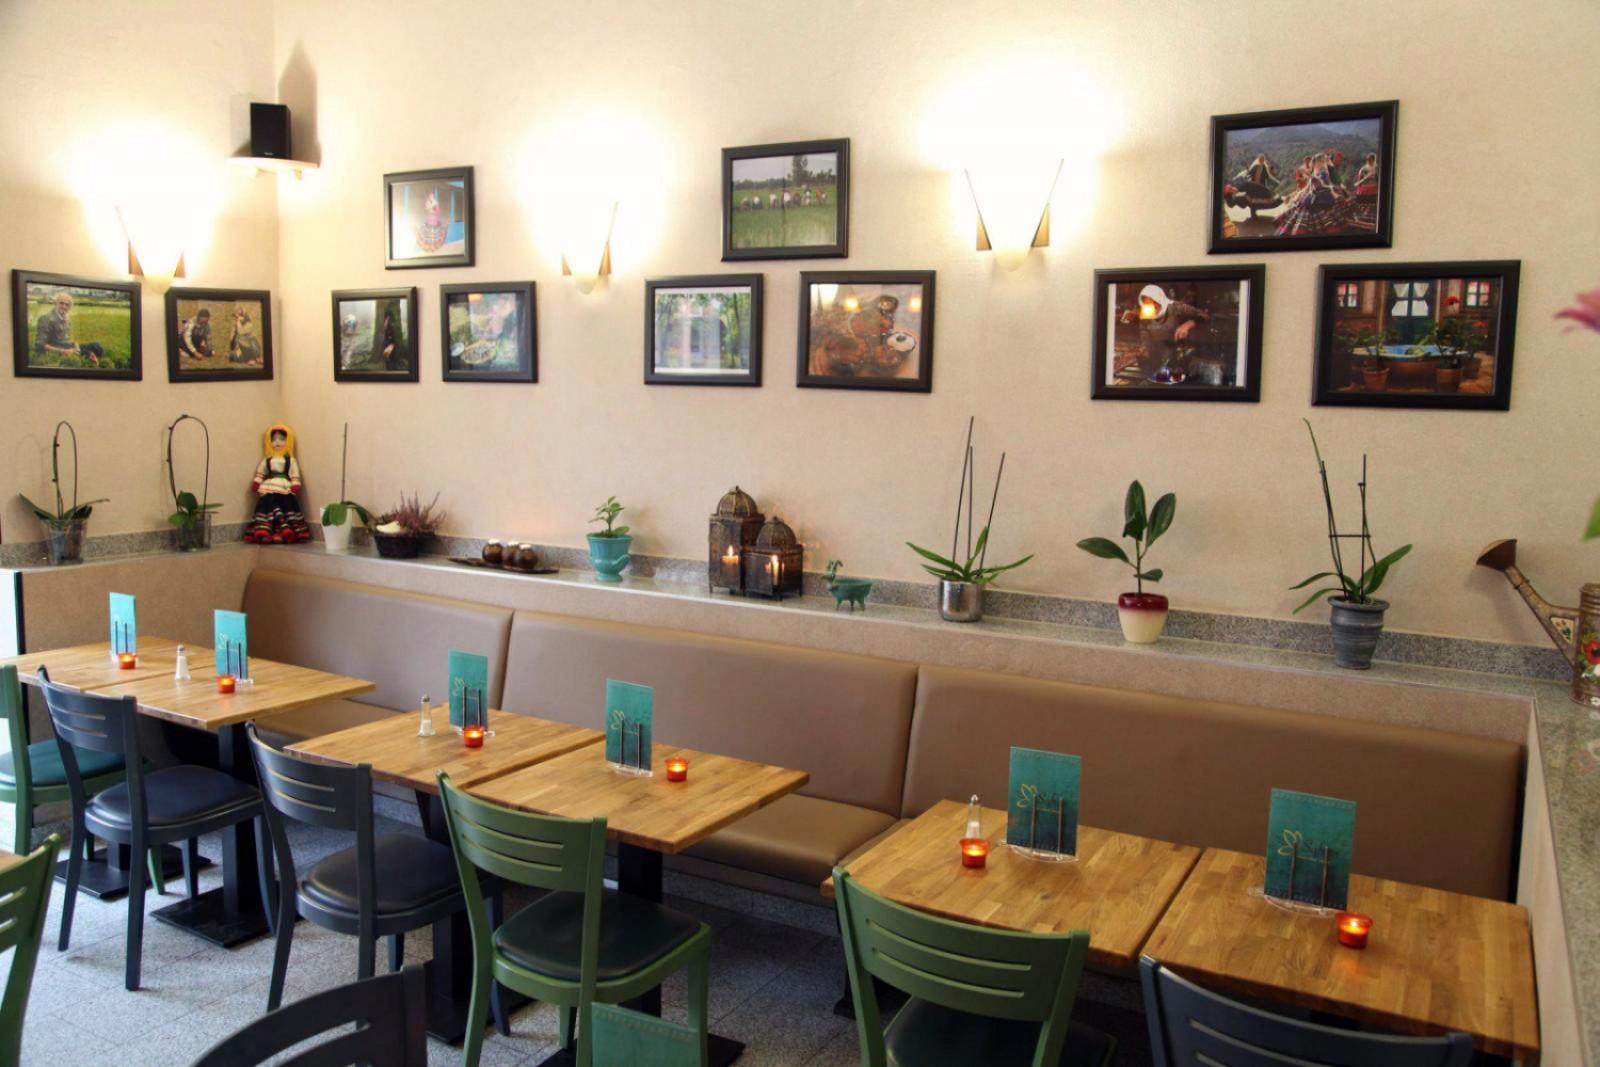 Restaurant In Wiesbaden